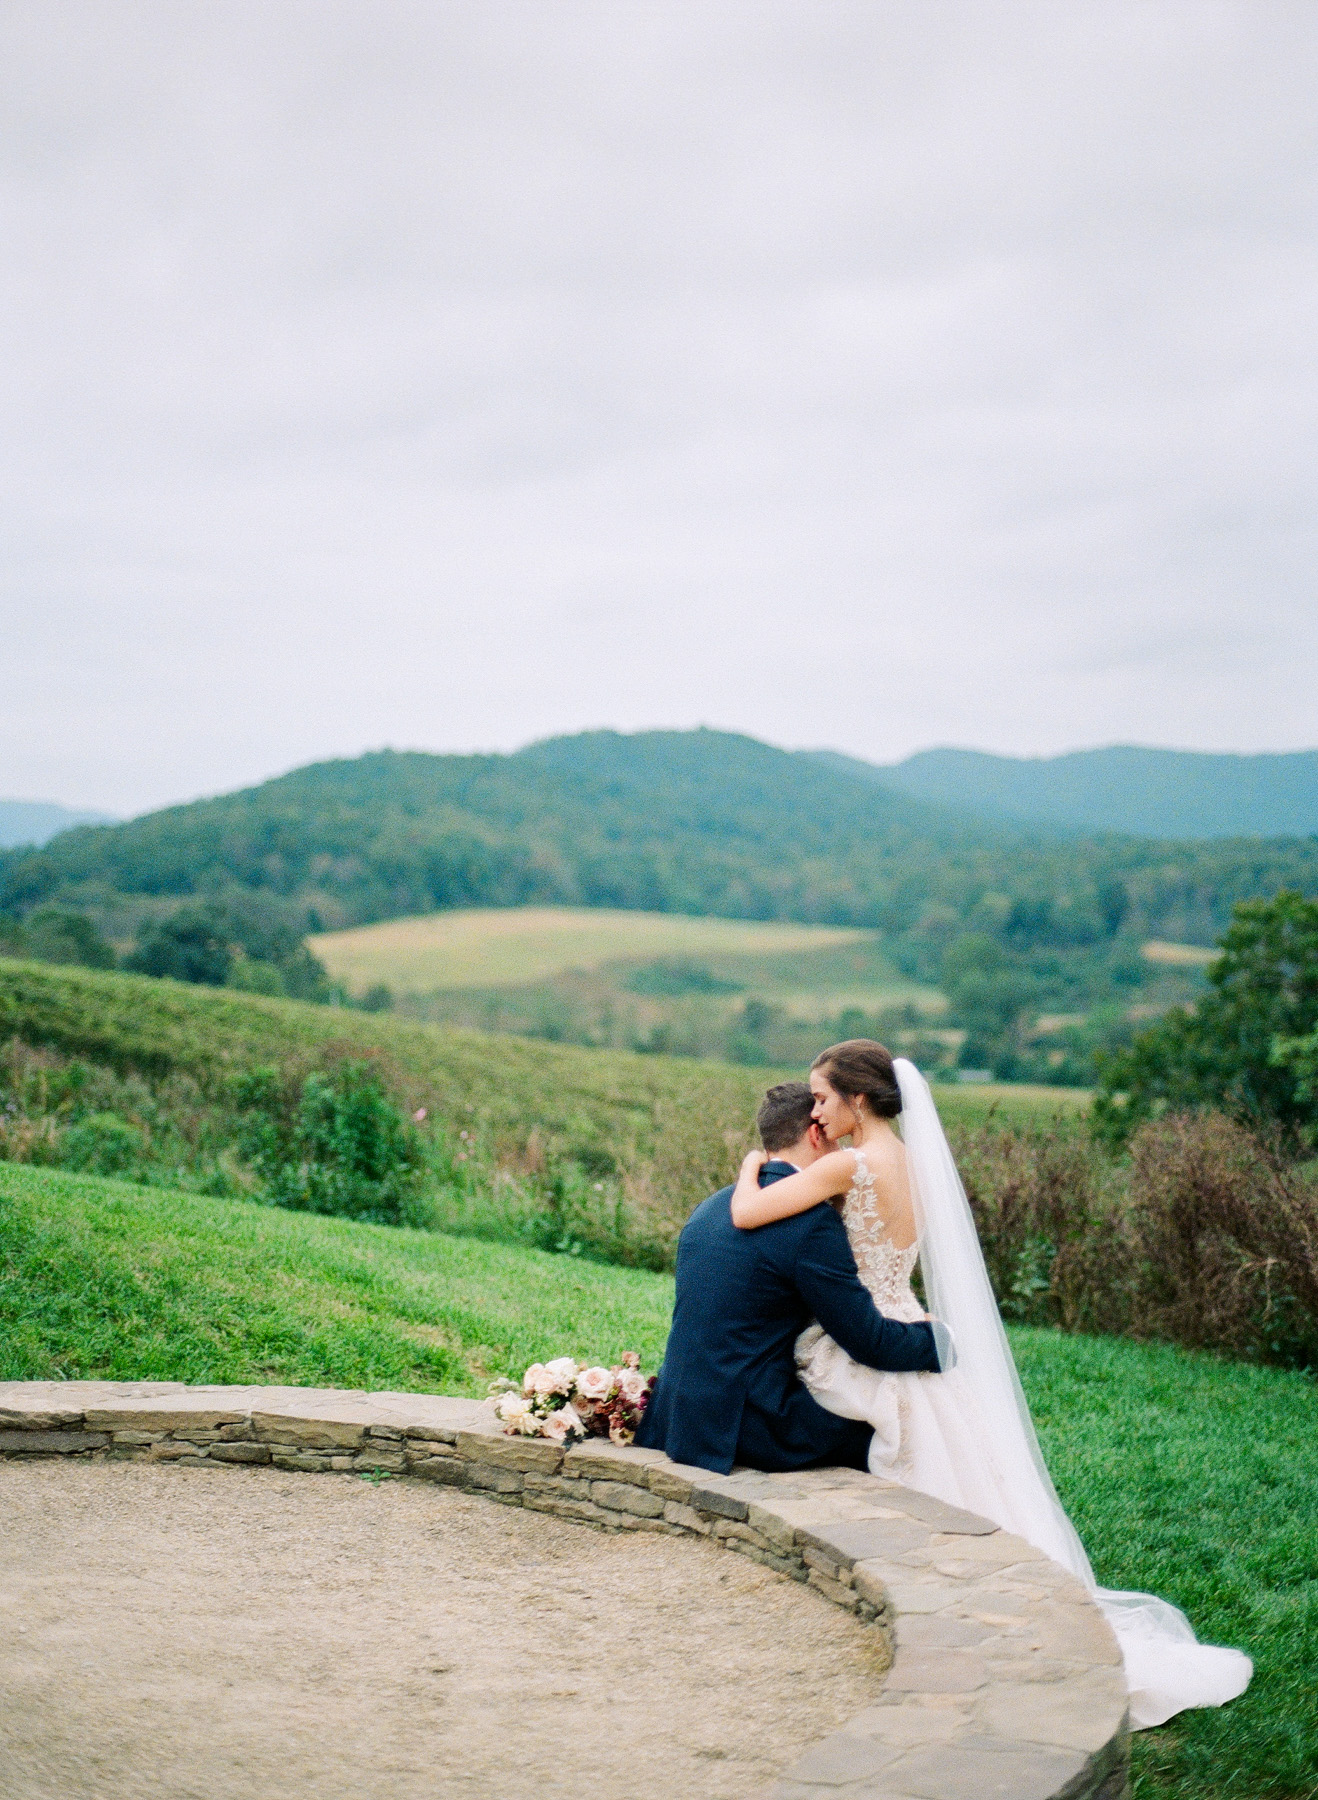 Pippin-Hill-Farm-and-Vinyards-Wedding-Film-Photography-37.jpg